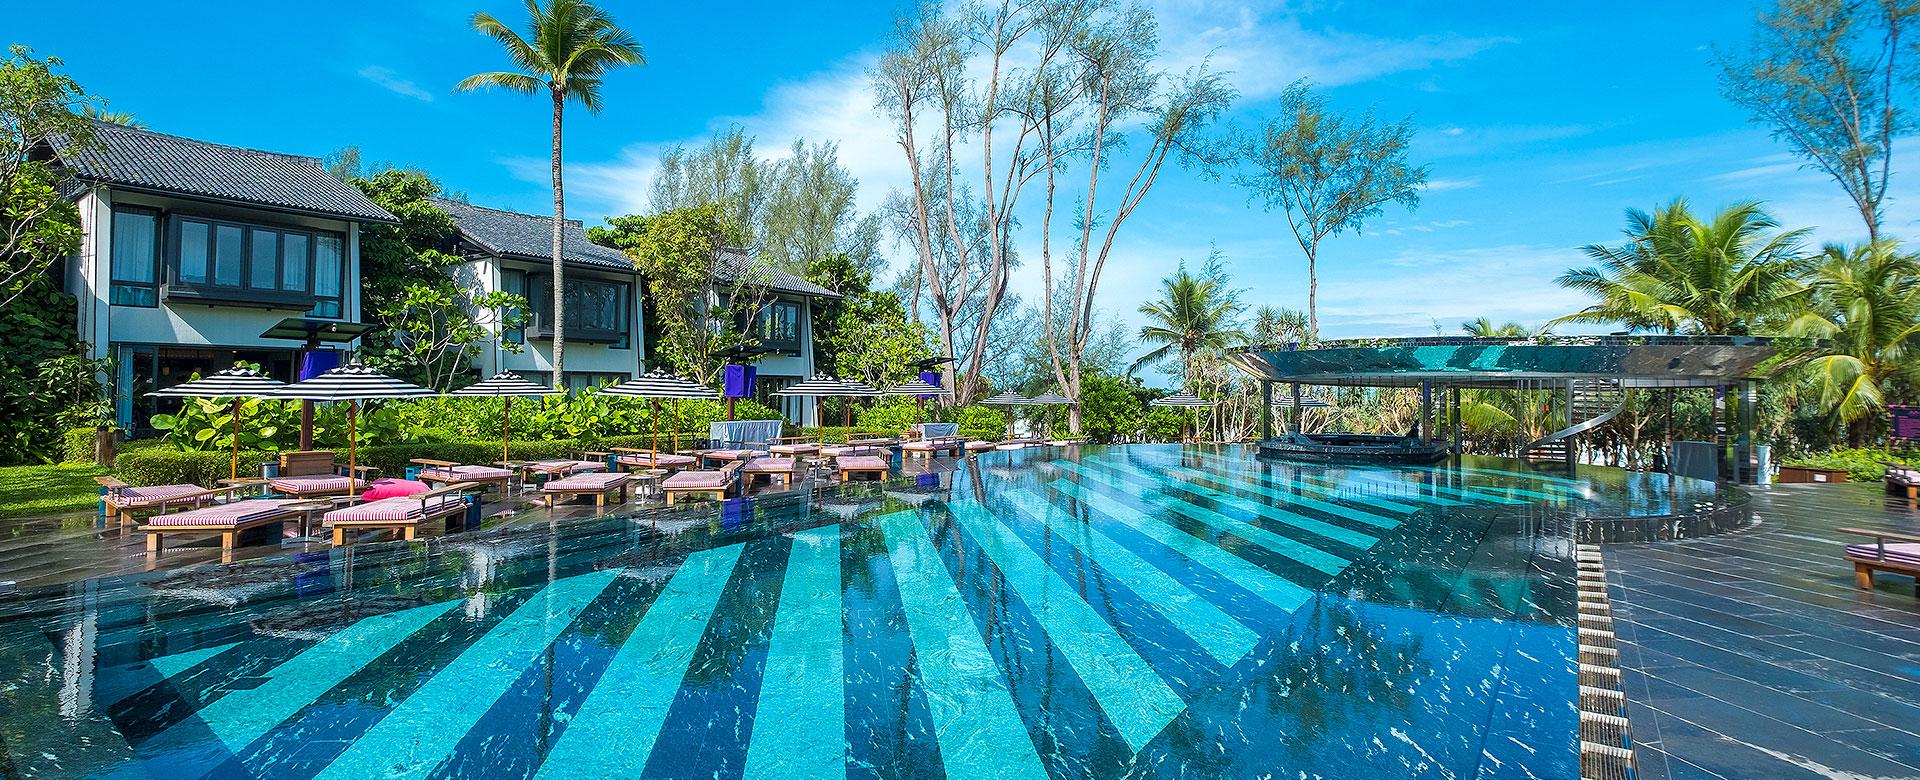 5-Facilities-Baba-Beach-Club-Luxury-Hotel-Phuket-by-Sri-Panwa